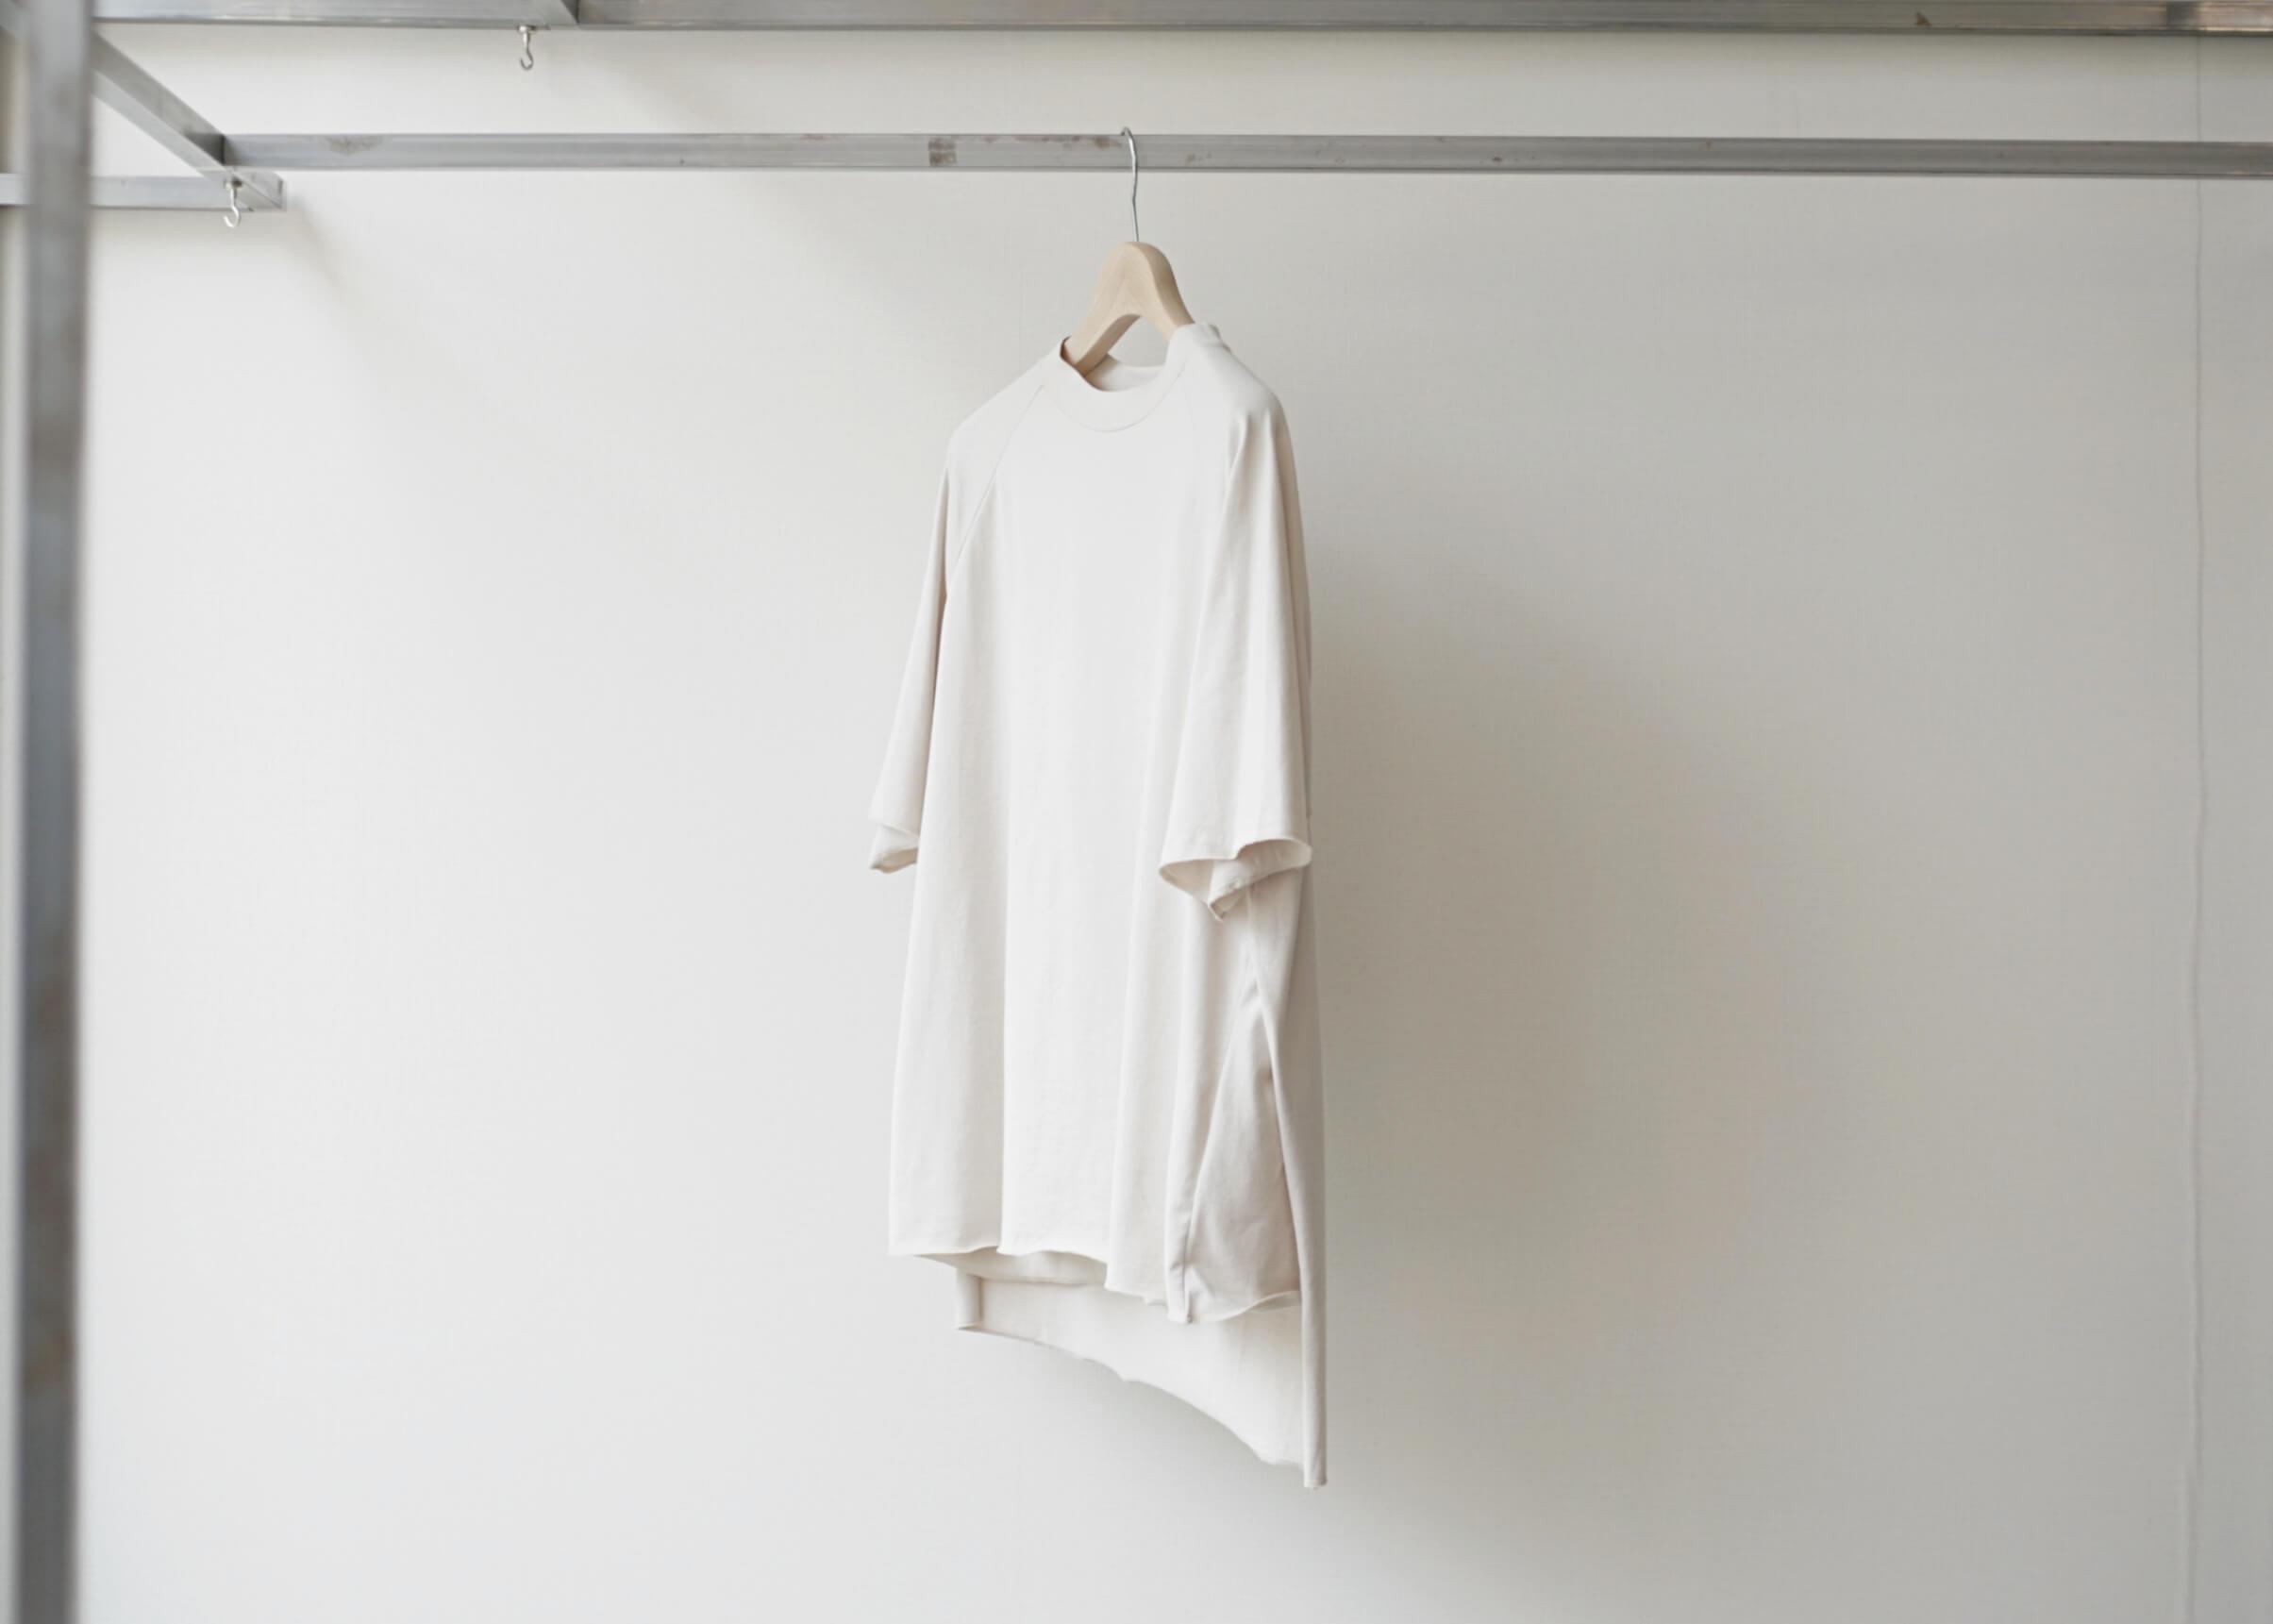 thee apron s/s beigeの横からの写真